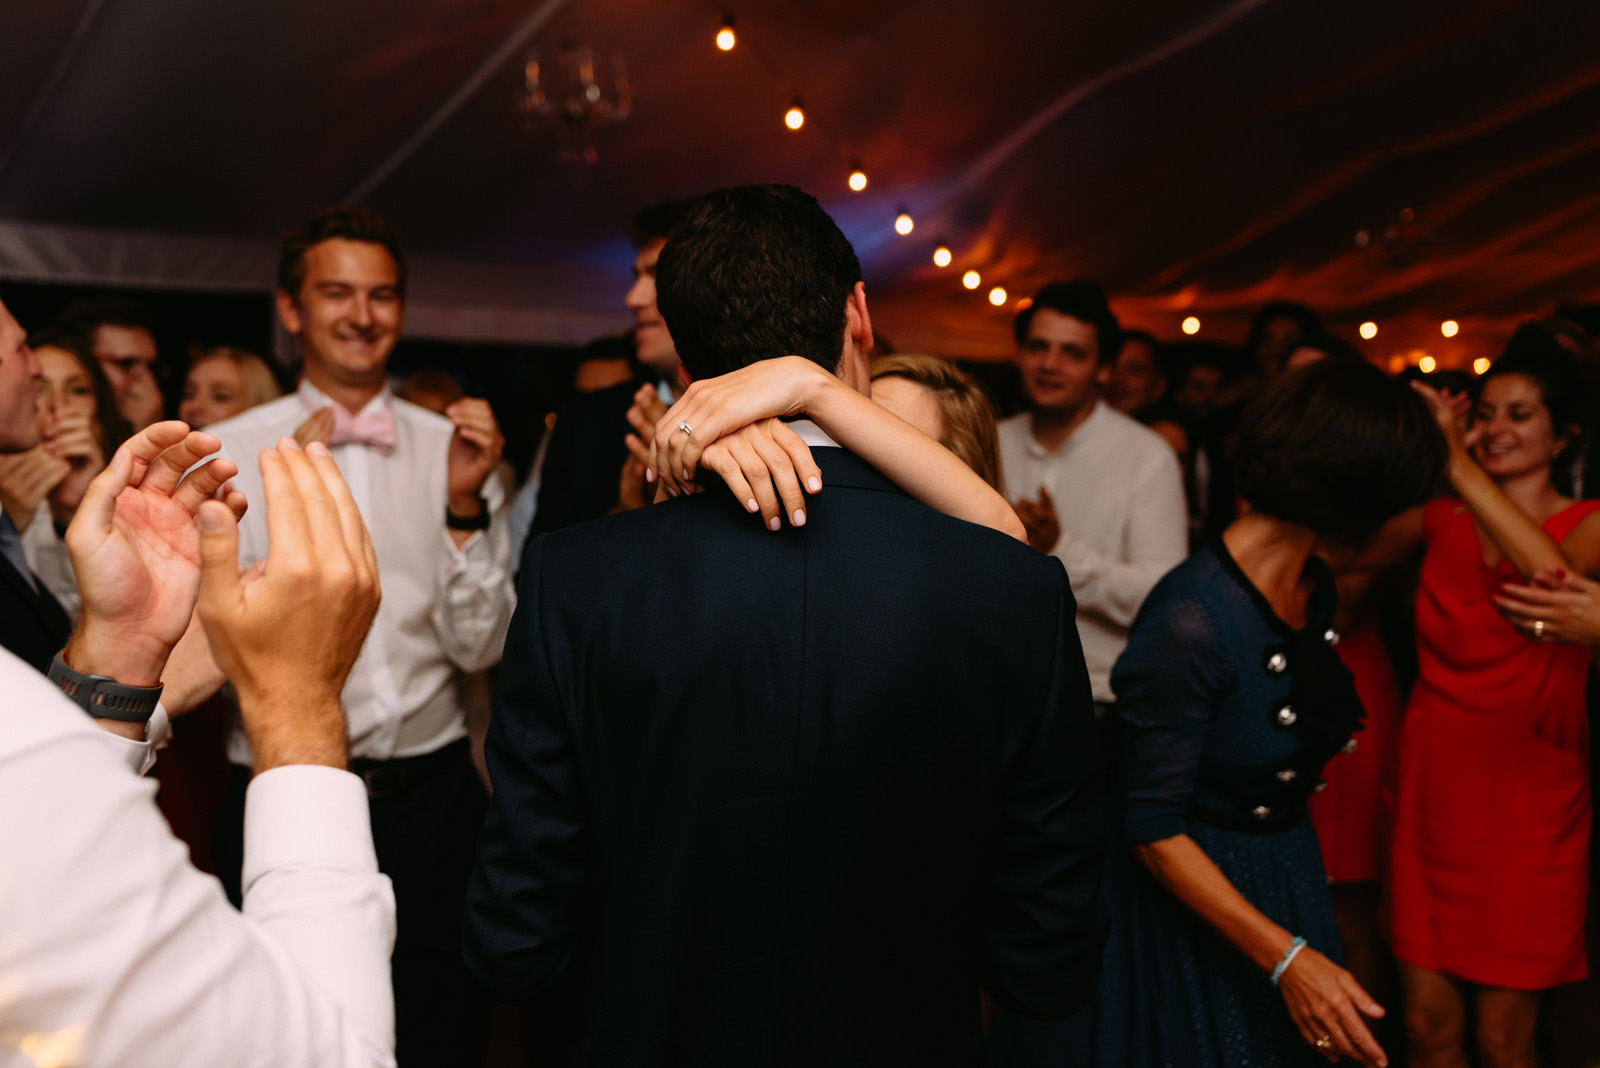 Zabawa weselna w Palacu Zdunowo- Luke Sezeck fotograf ślubny